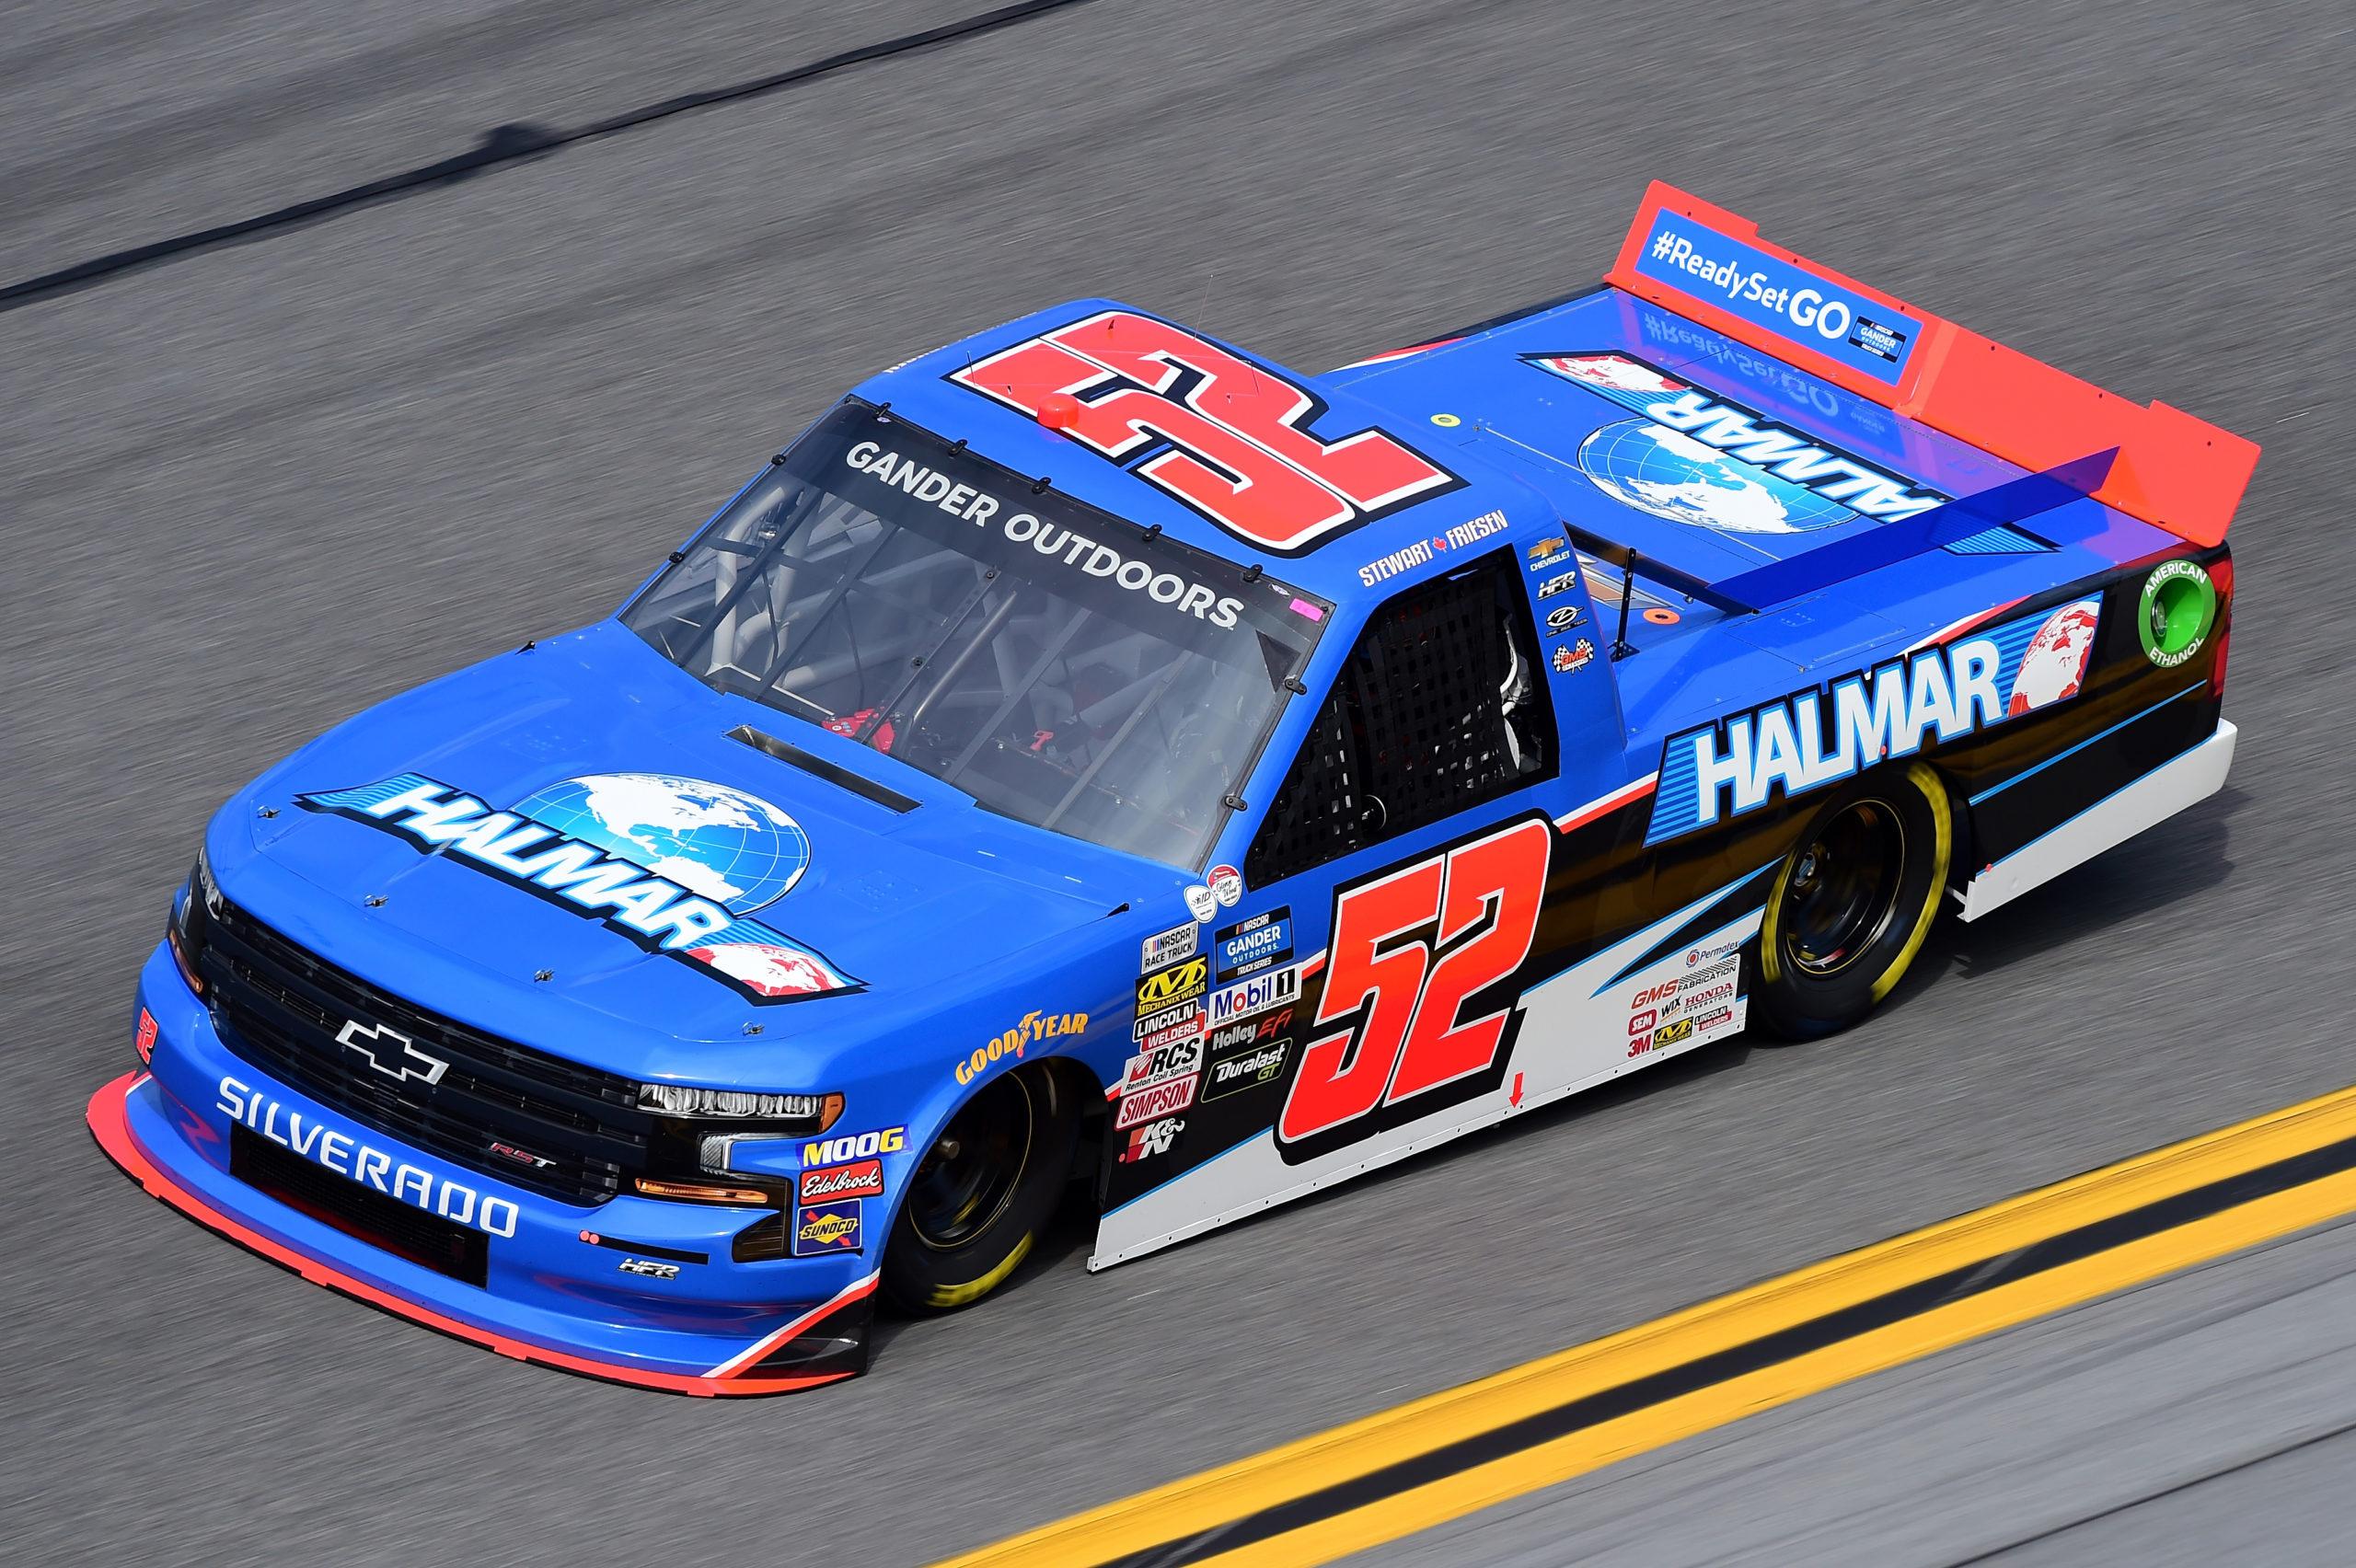 Canadian NASCAR driver